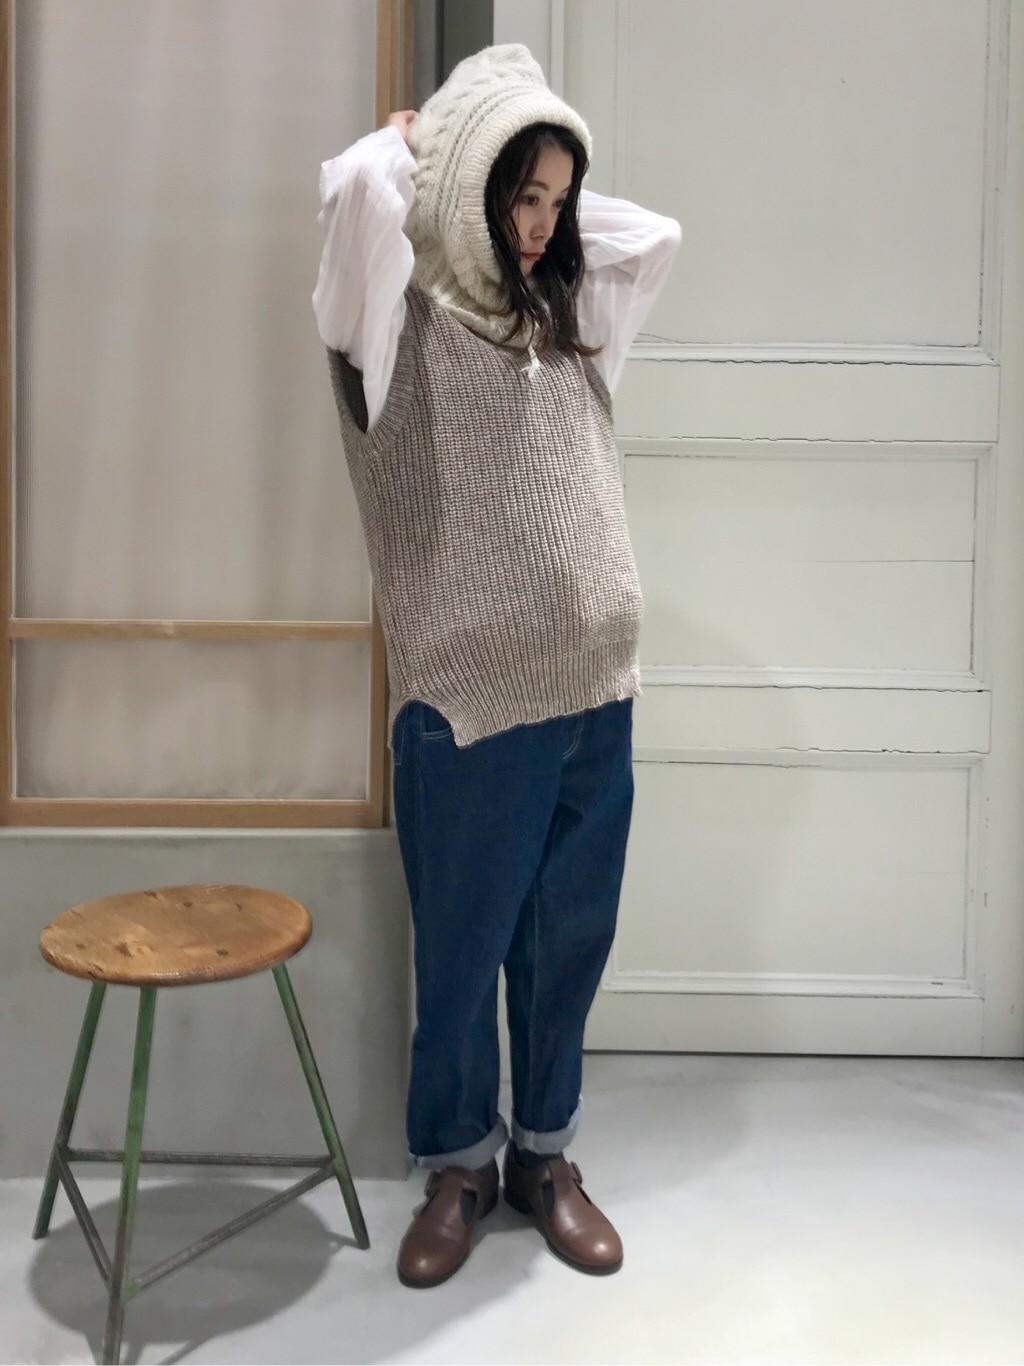 bulle de savon 渋谷スクランブルスクエア 身長:153cm 2020.10.07